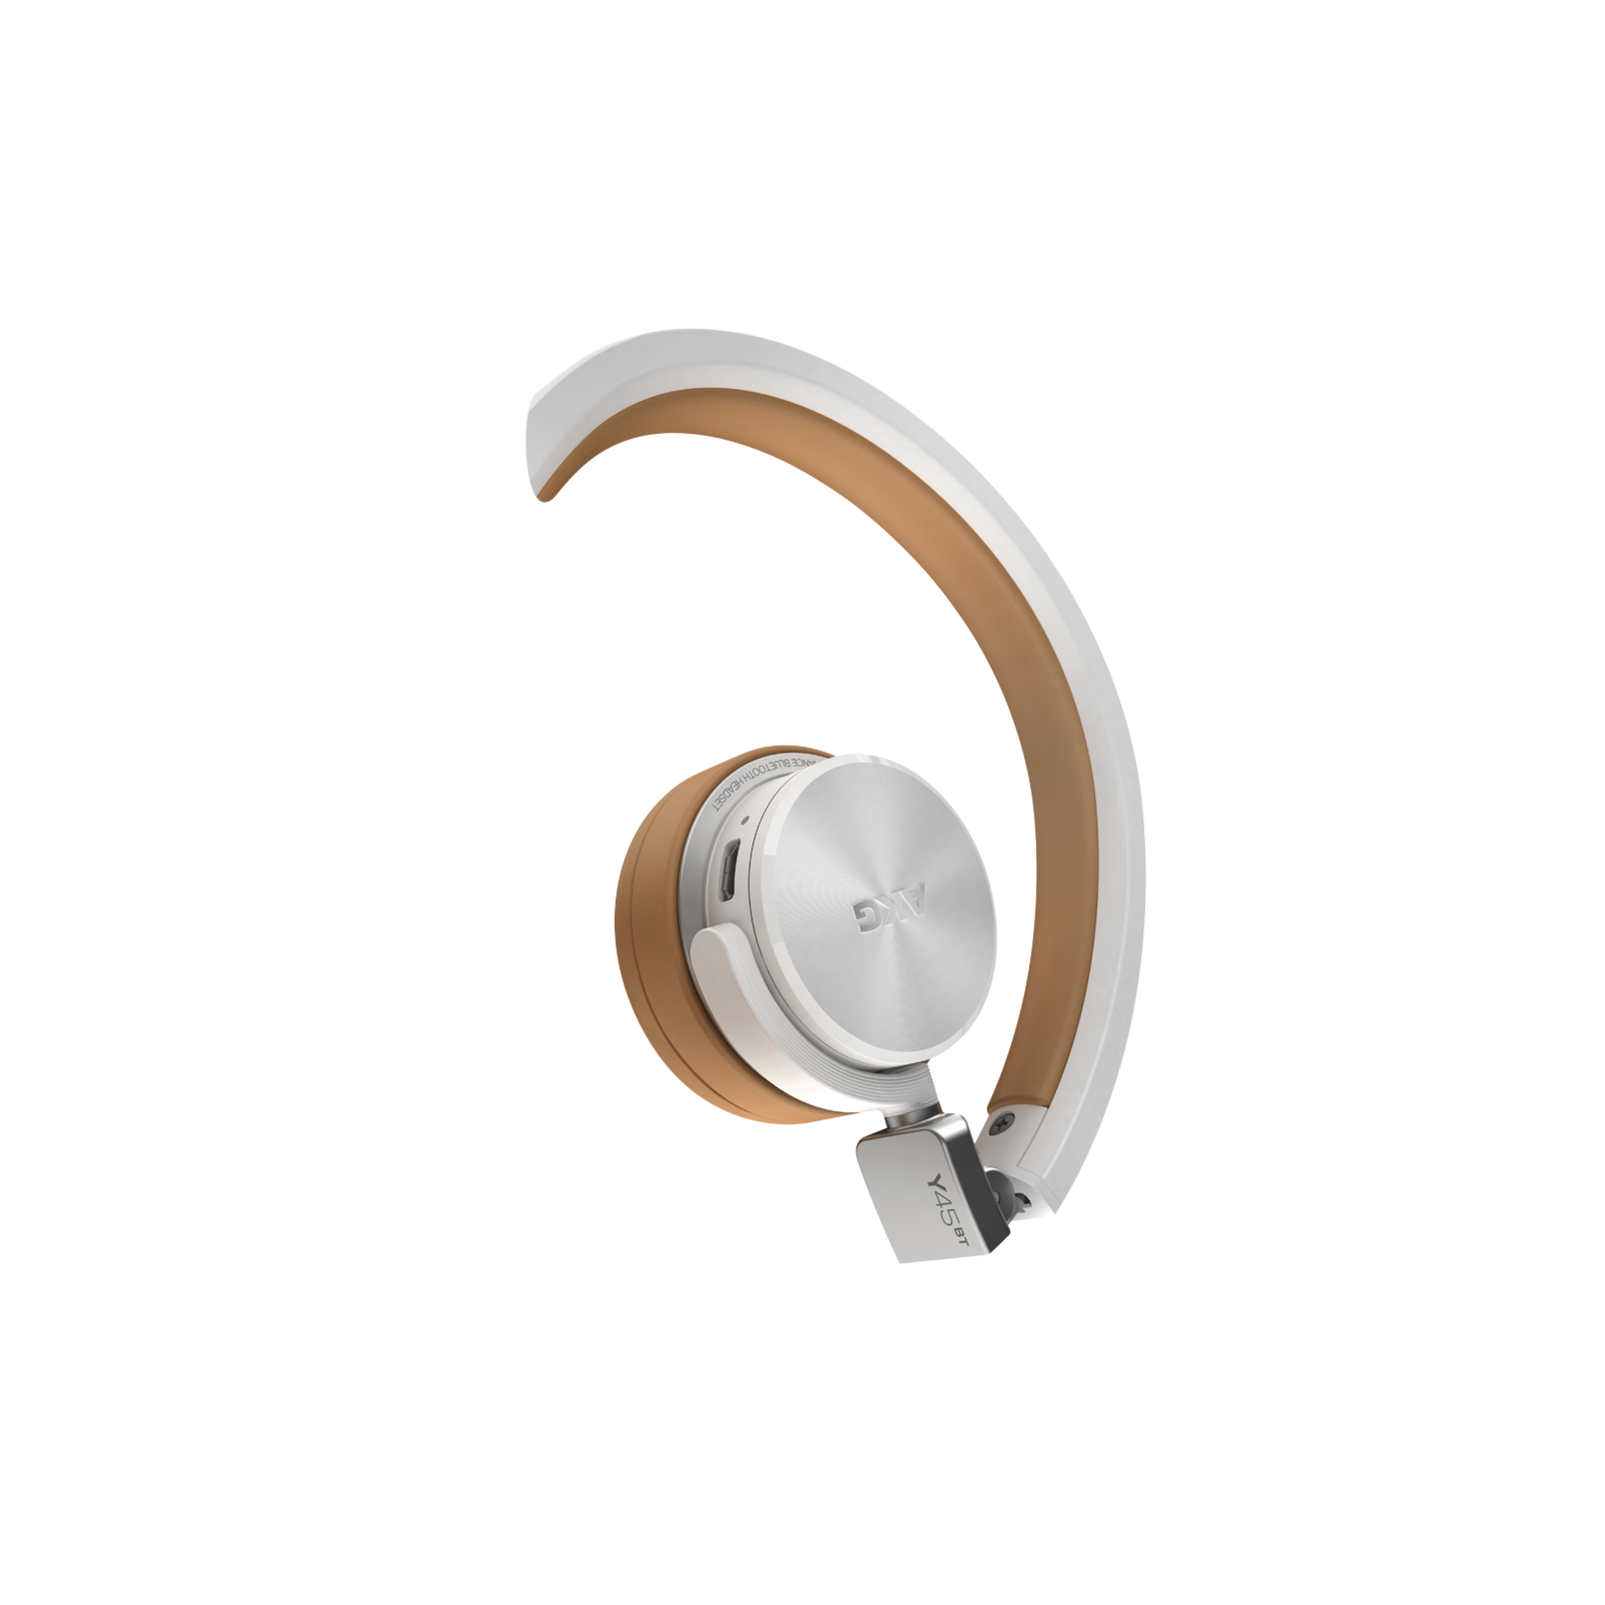 Y45BT - White - High performance foldable Bluetooth® headset - Detailshot 1